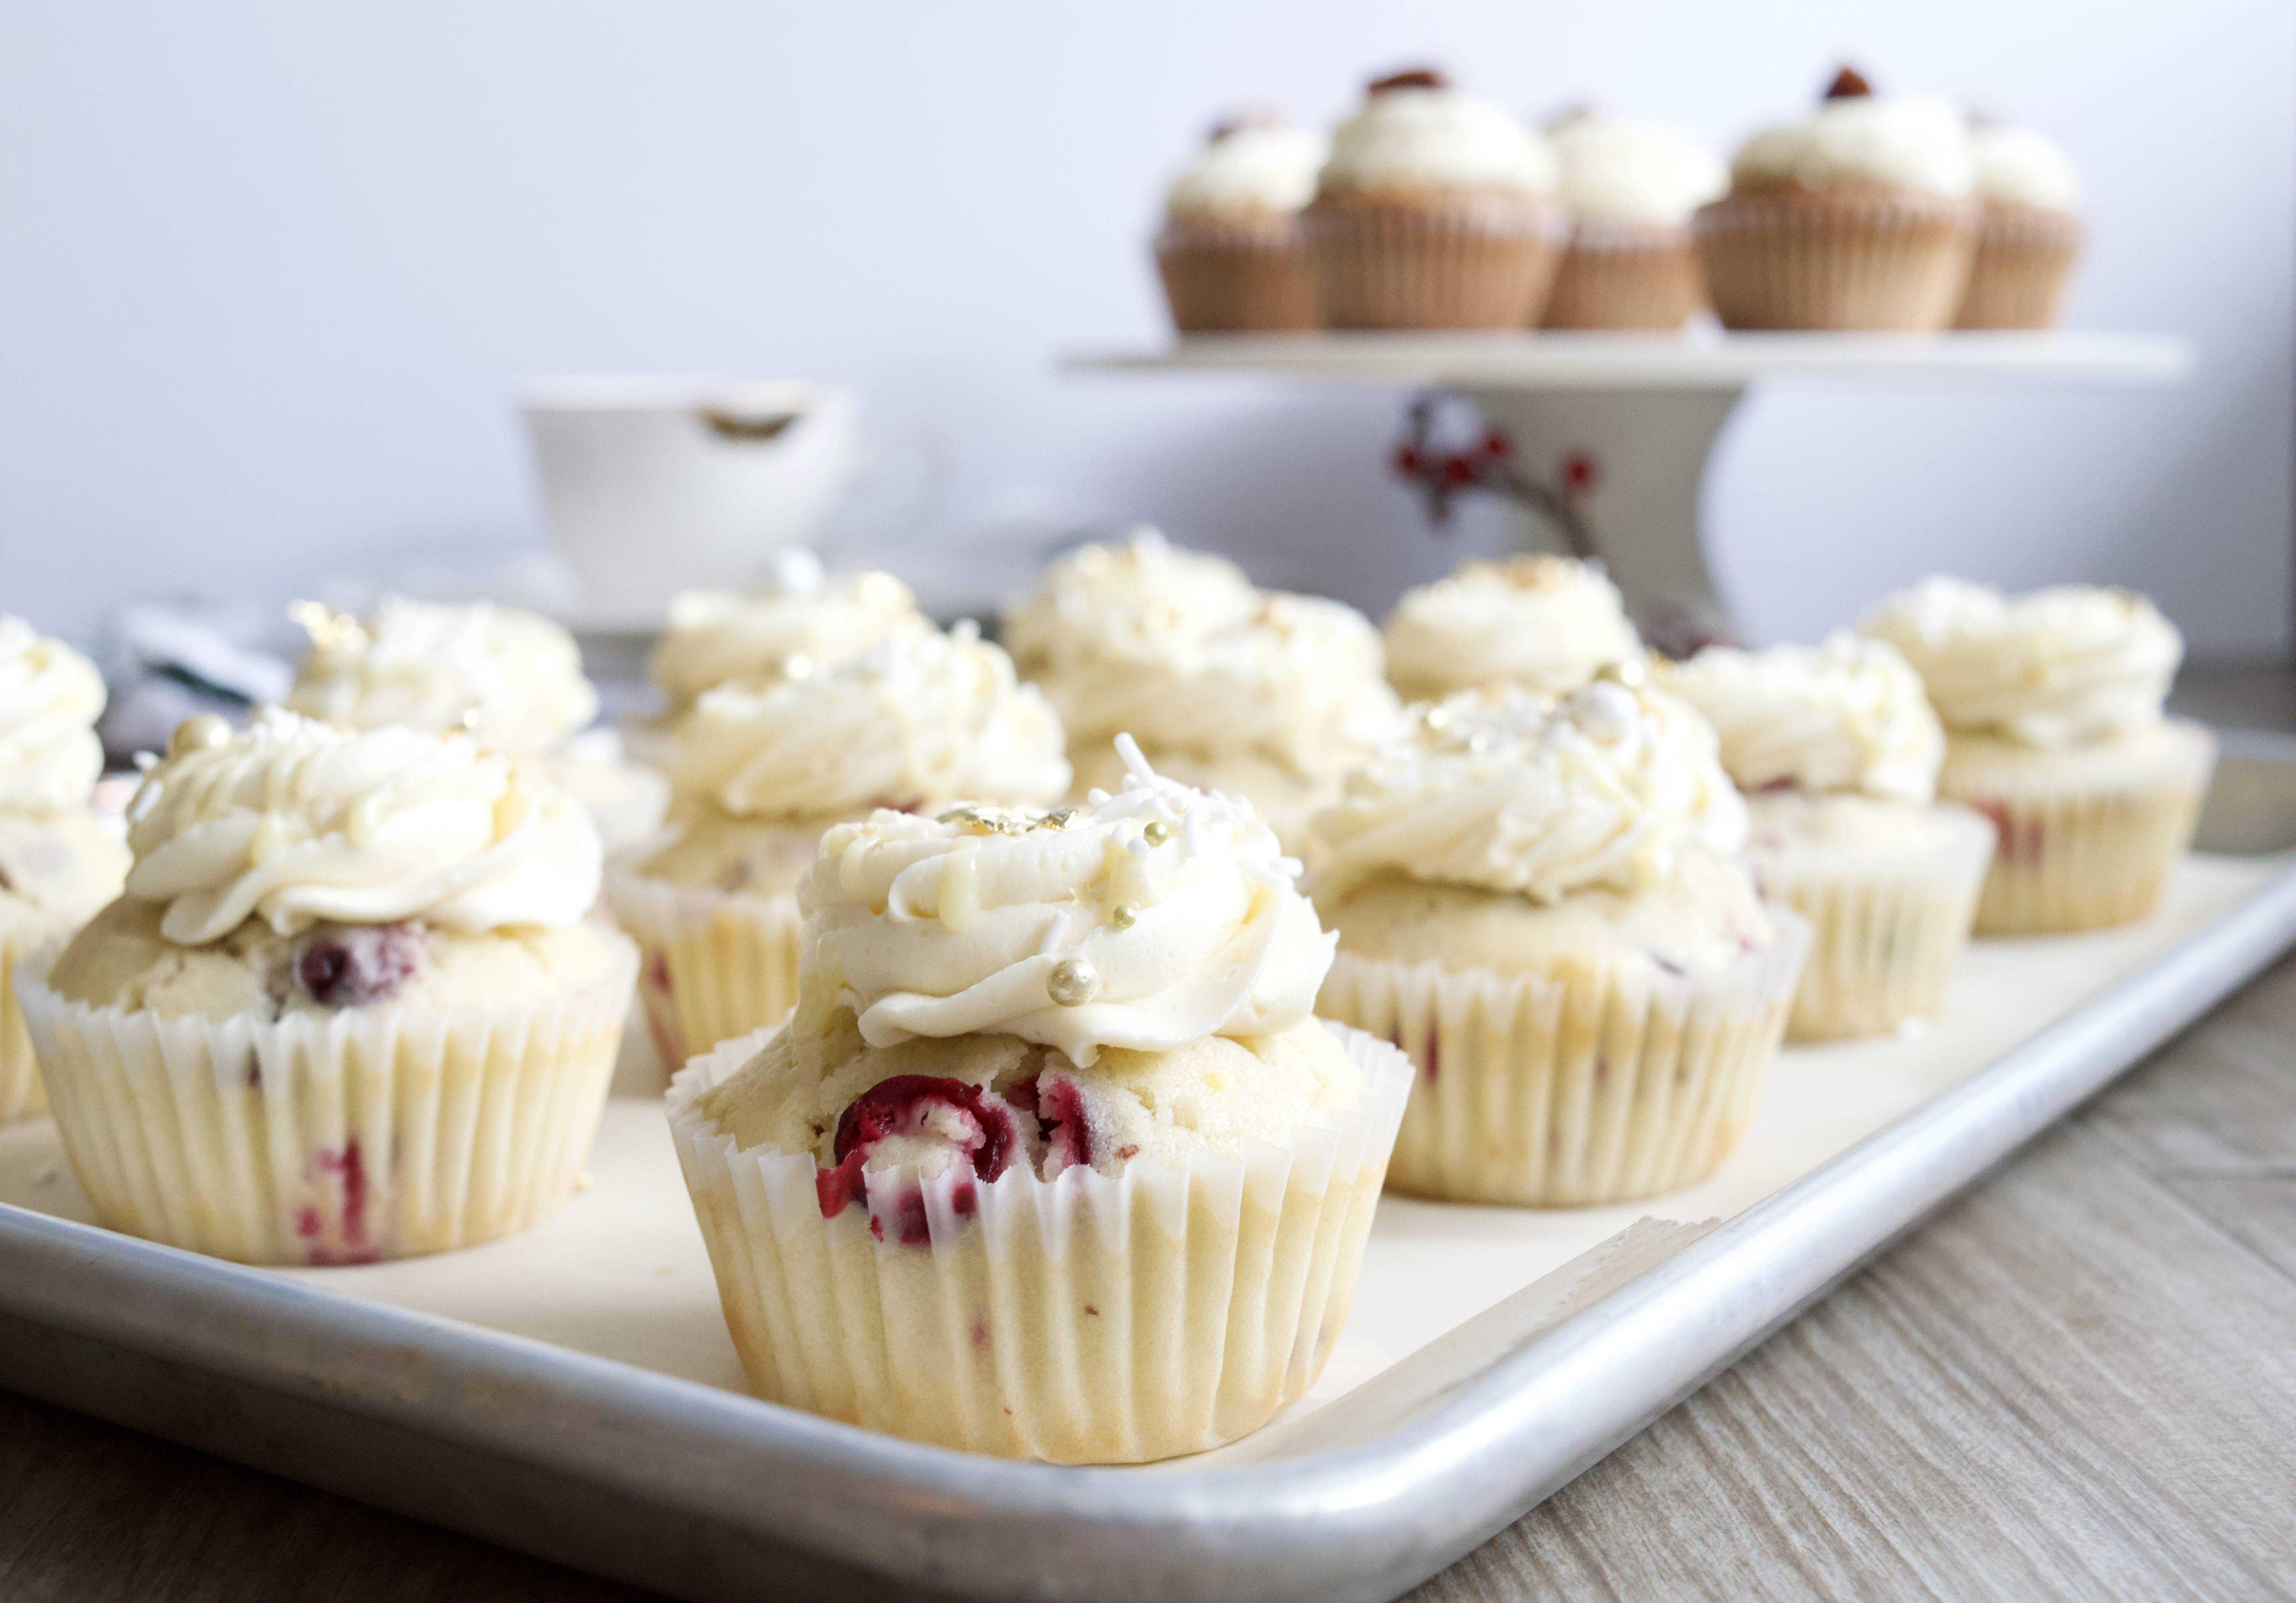 Cranberry-white chocolate cupcakes